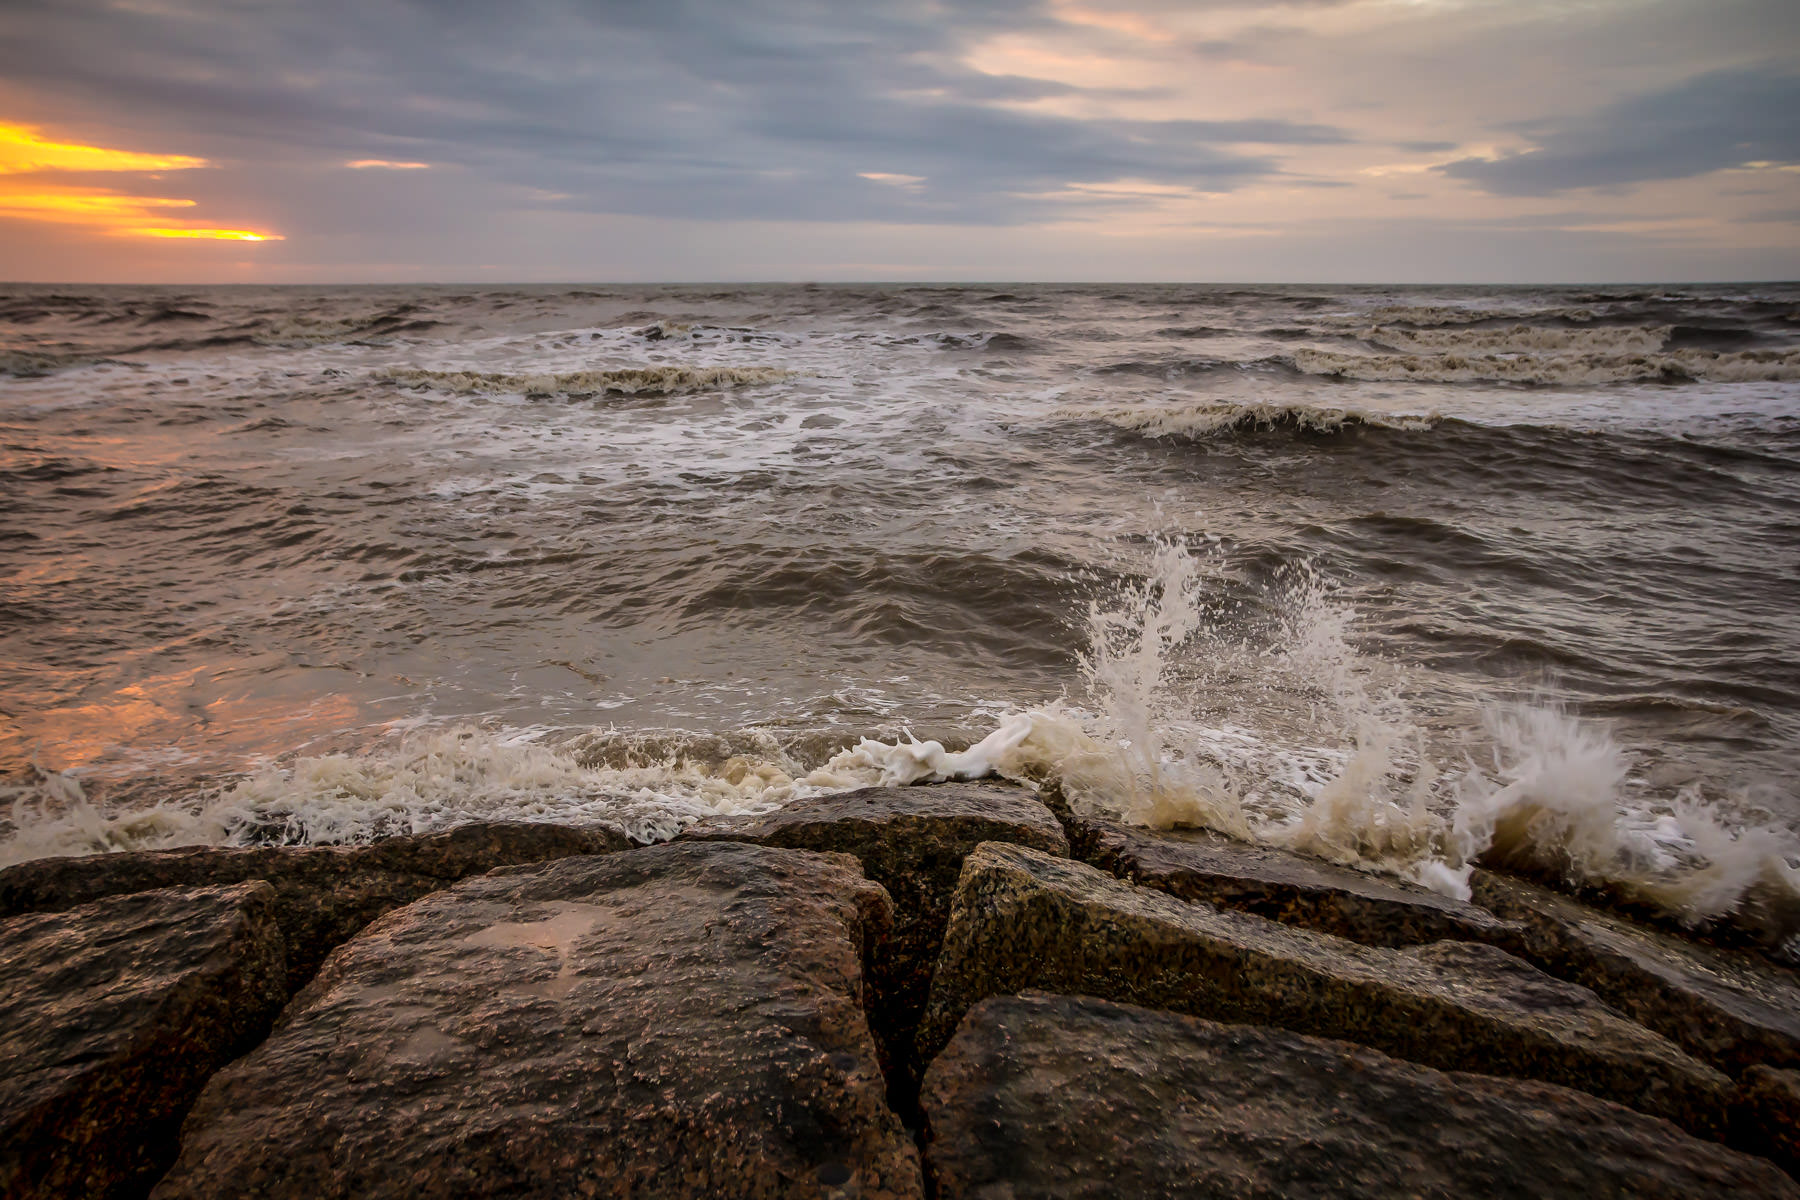 Early morning surf crashes into a granite groyne on the Galveston, Texas beach.